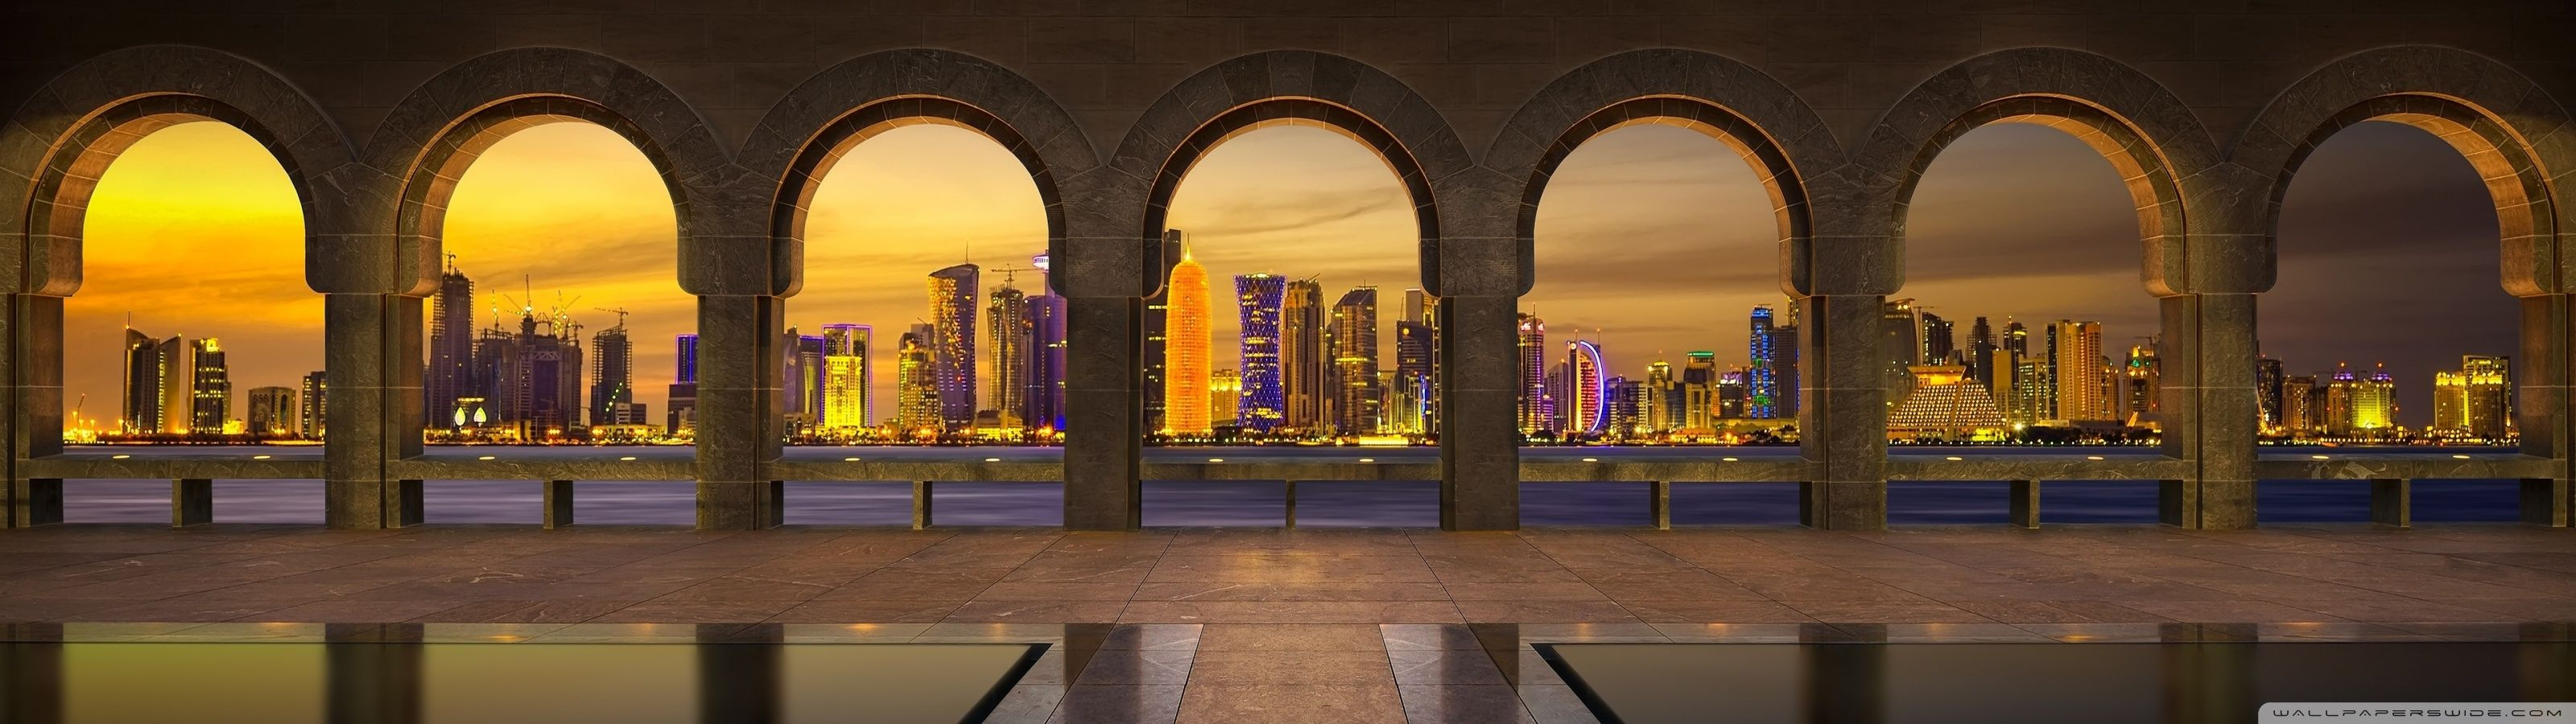 Arches HD desktop wallpaper Widescreen Fullscreen Mobile